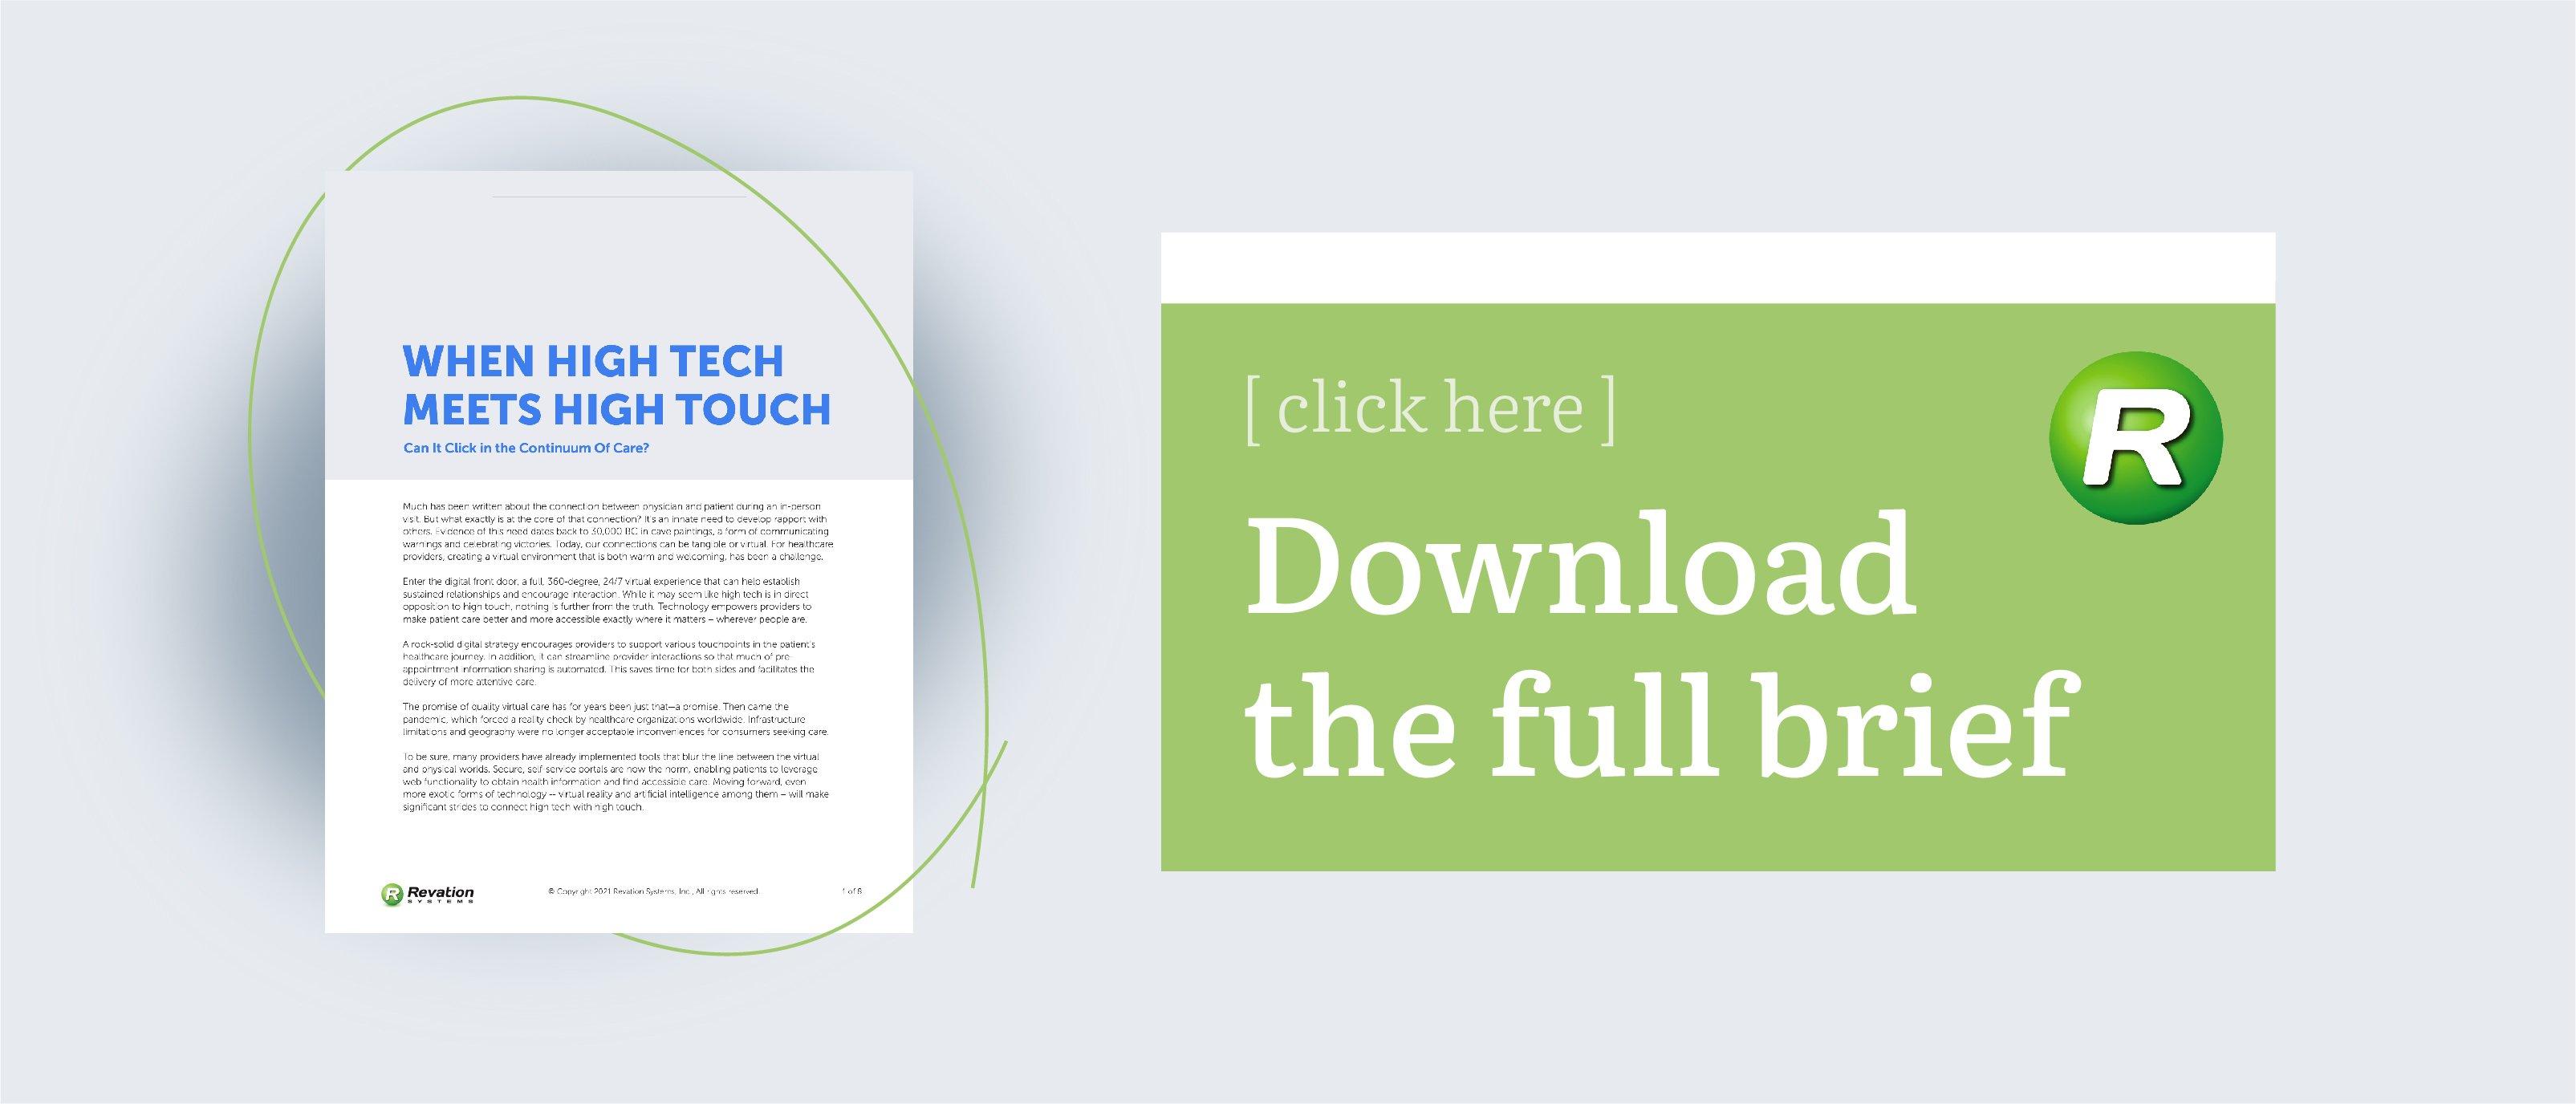 RC_Blog_HC_WhenHighTechMeetsHighTouch_CTA (1)